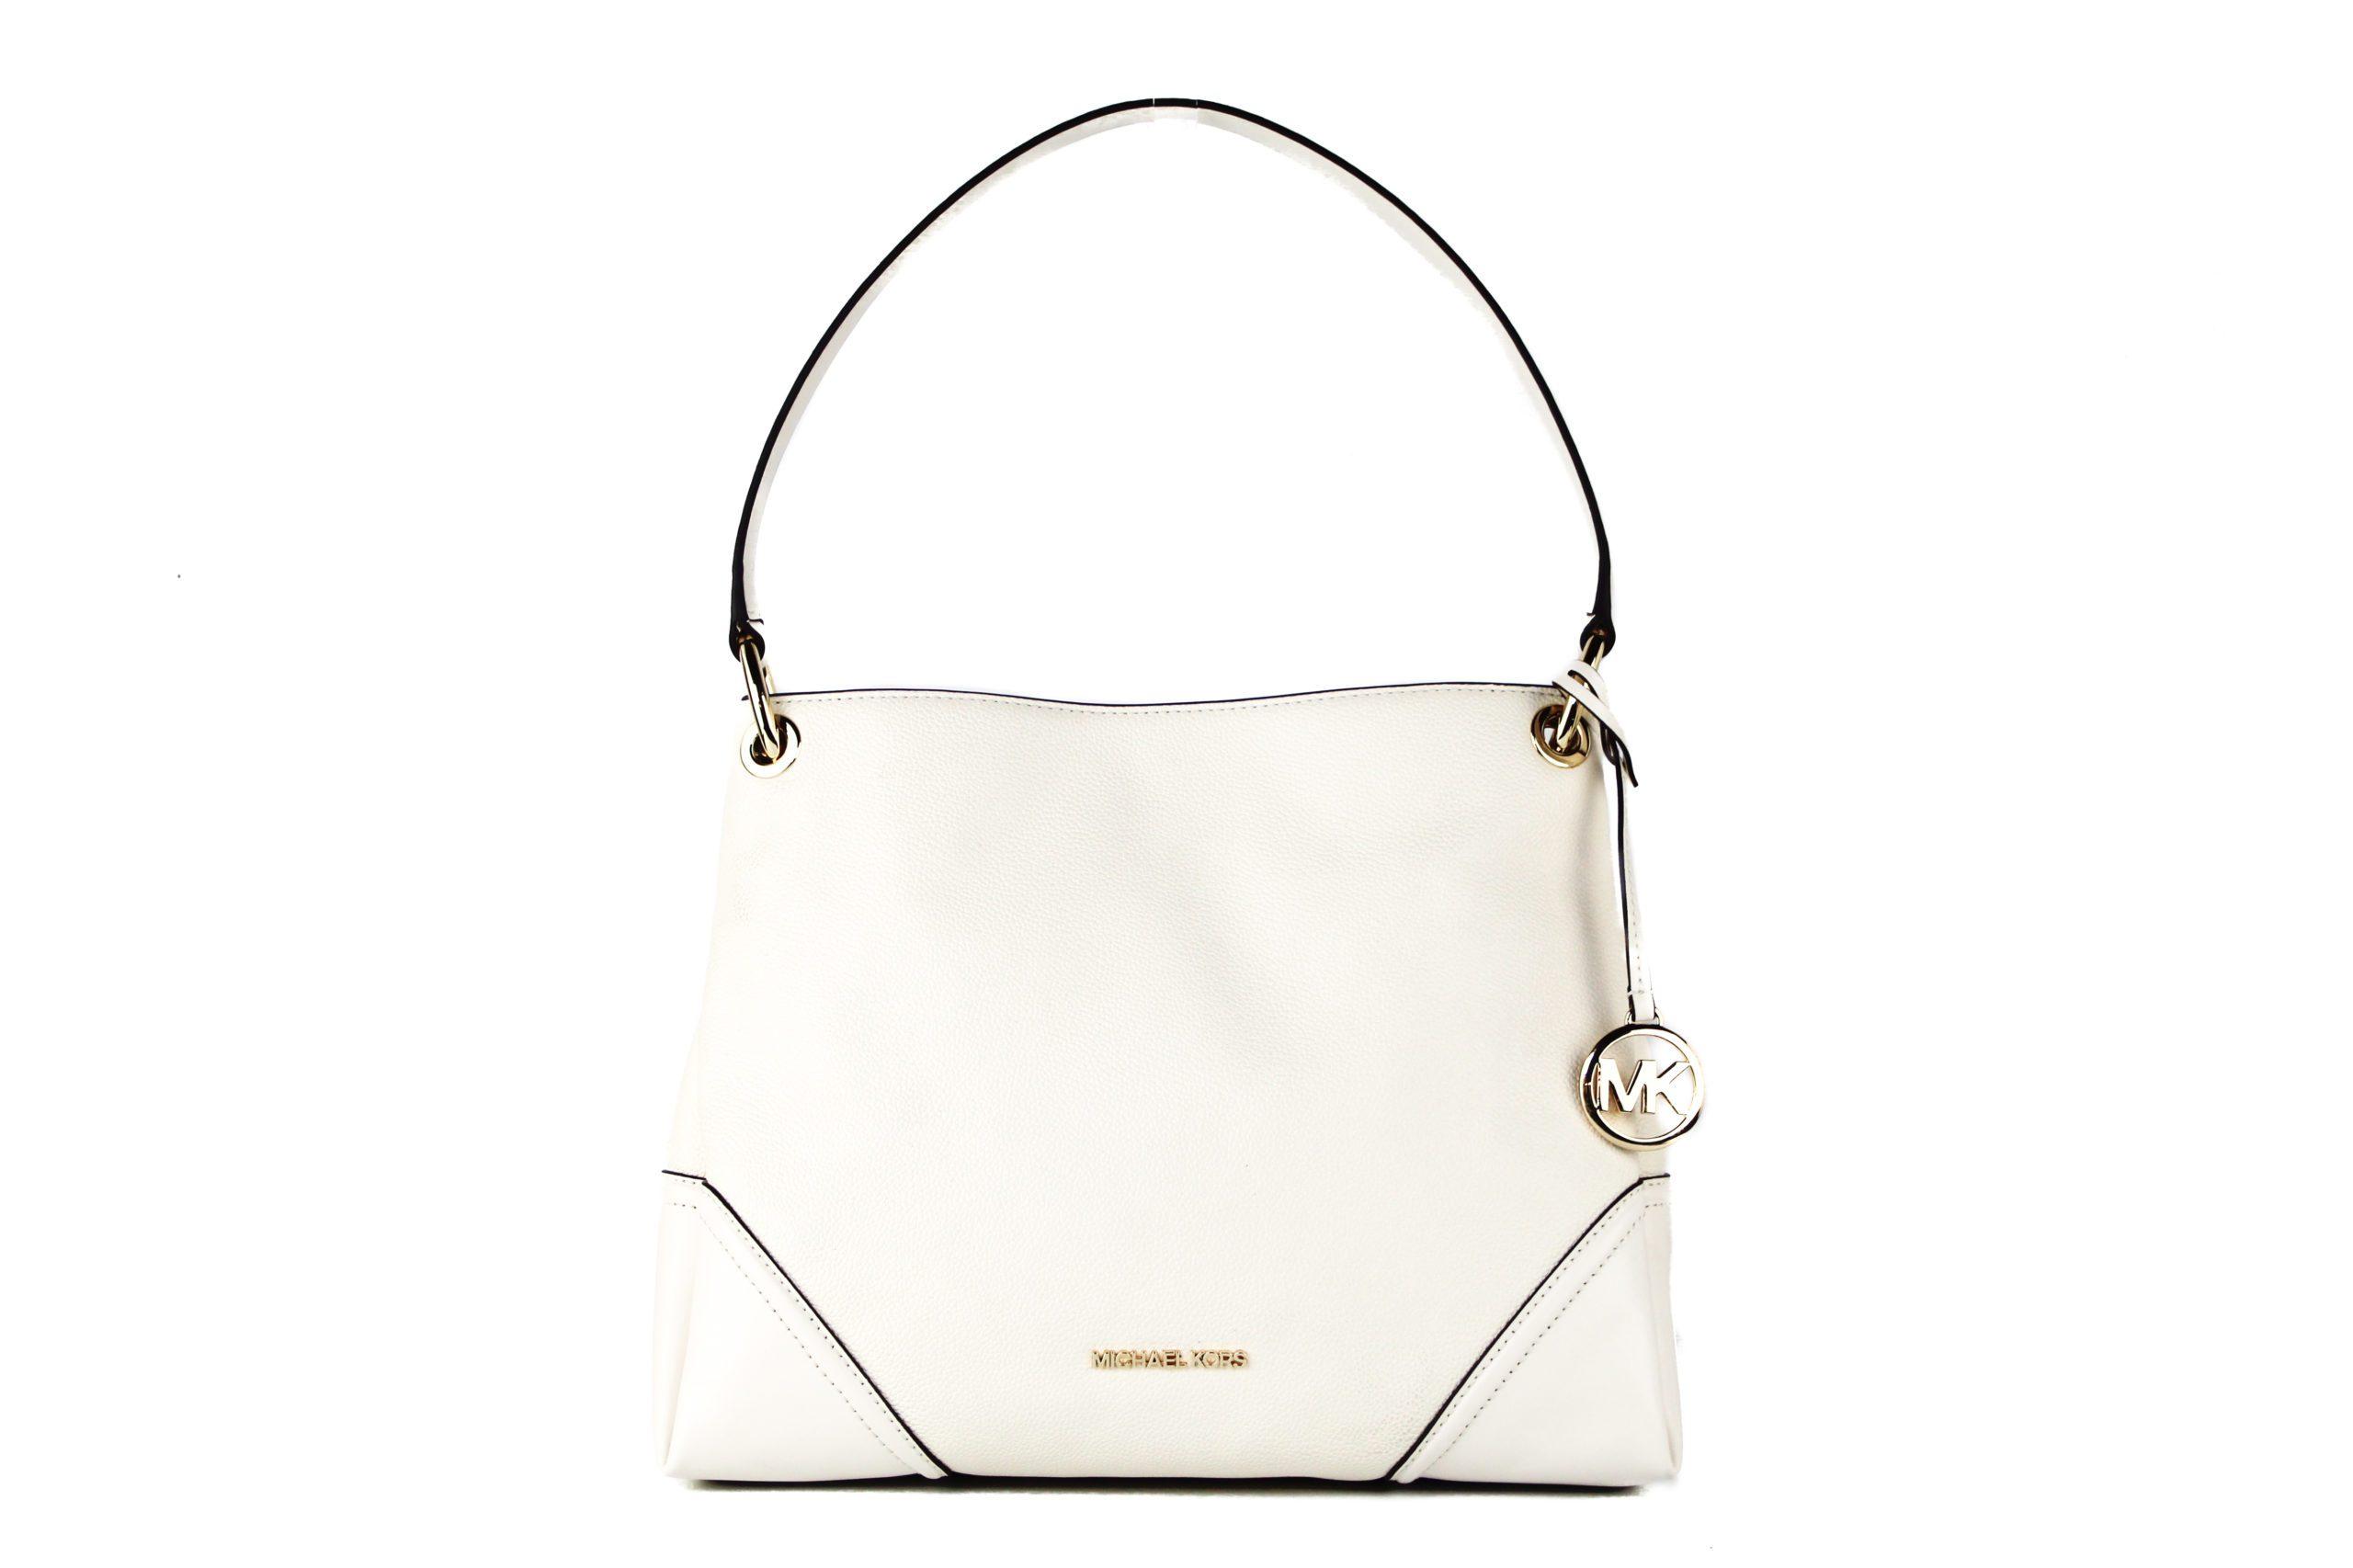 Michael Kors Women's Nicole Shoulder Bag Ivory 70849